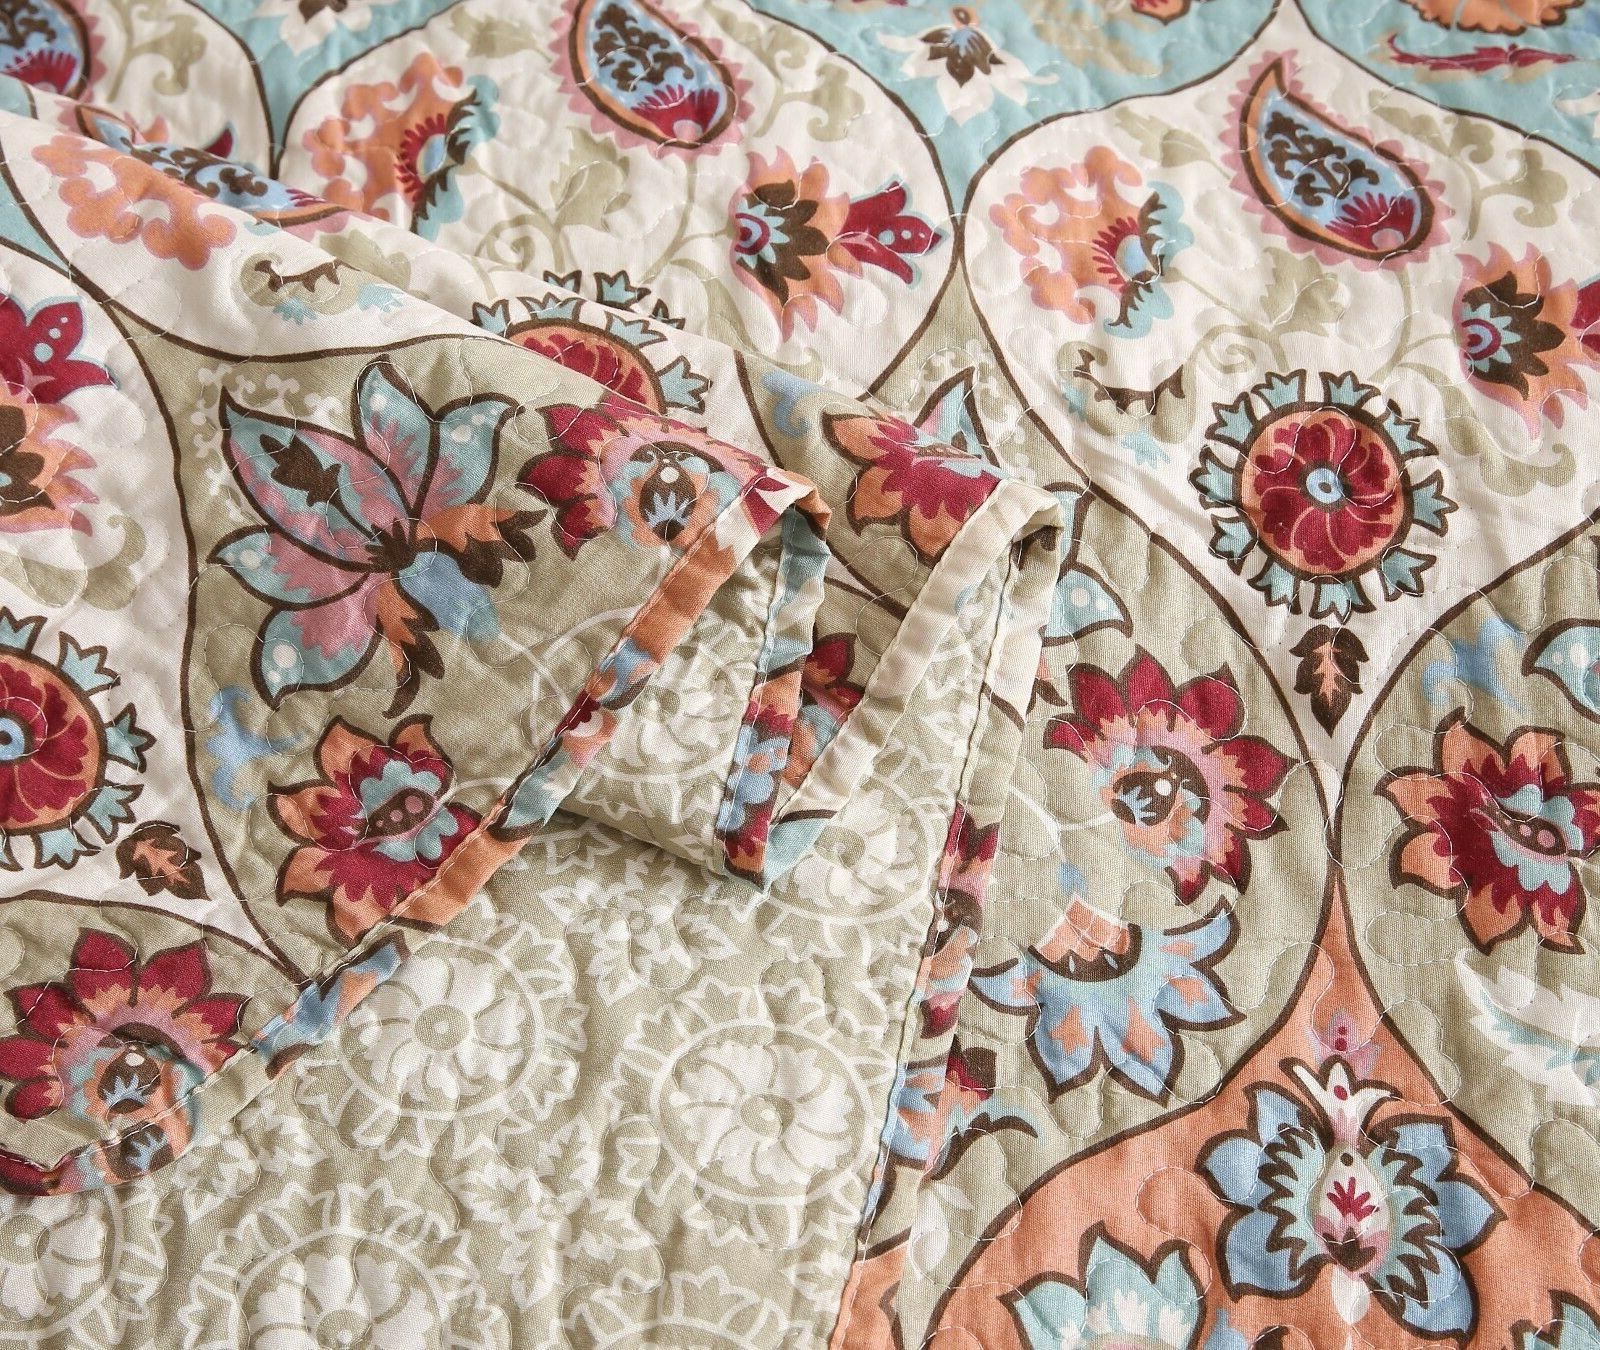 DaDa Vibrant Garden Paisley Coverlet Bedspread